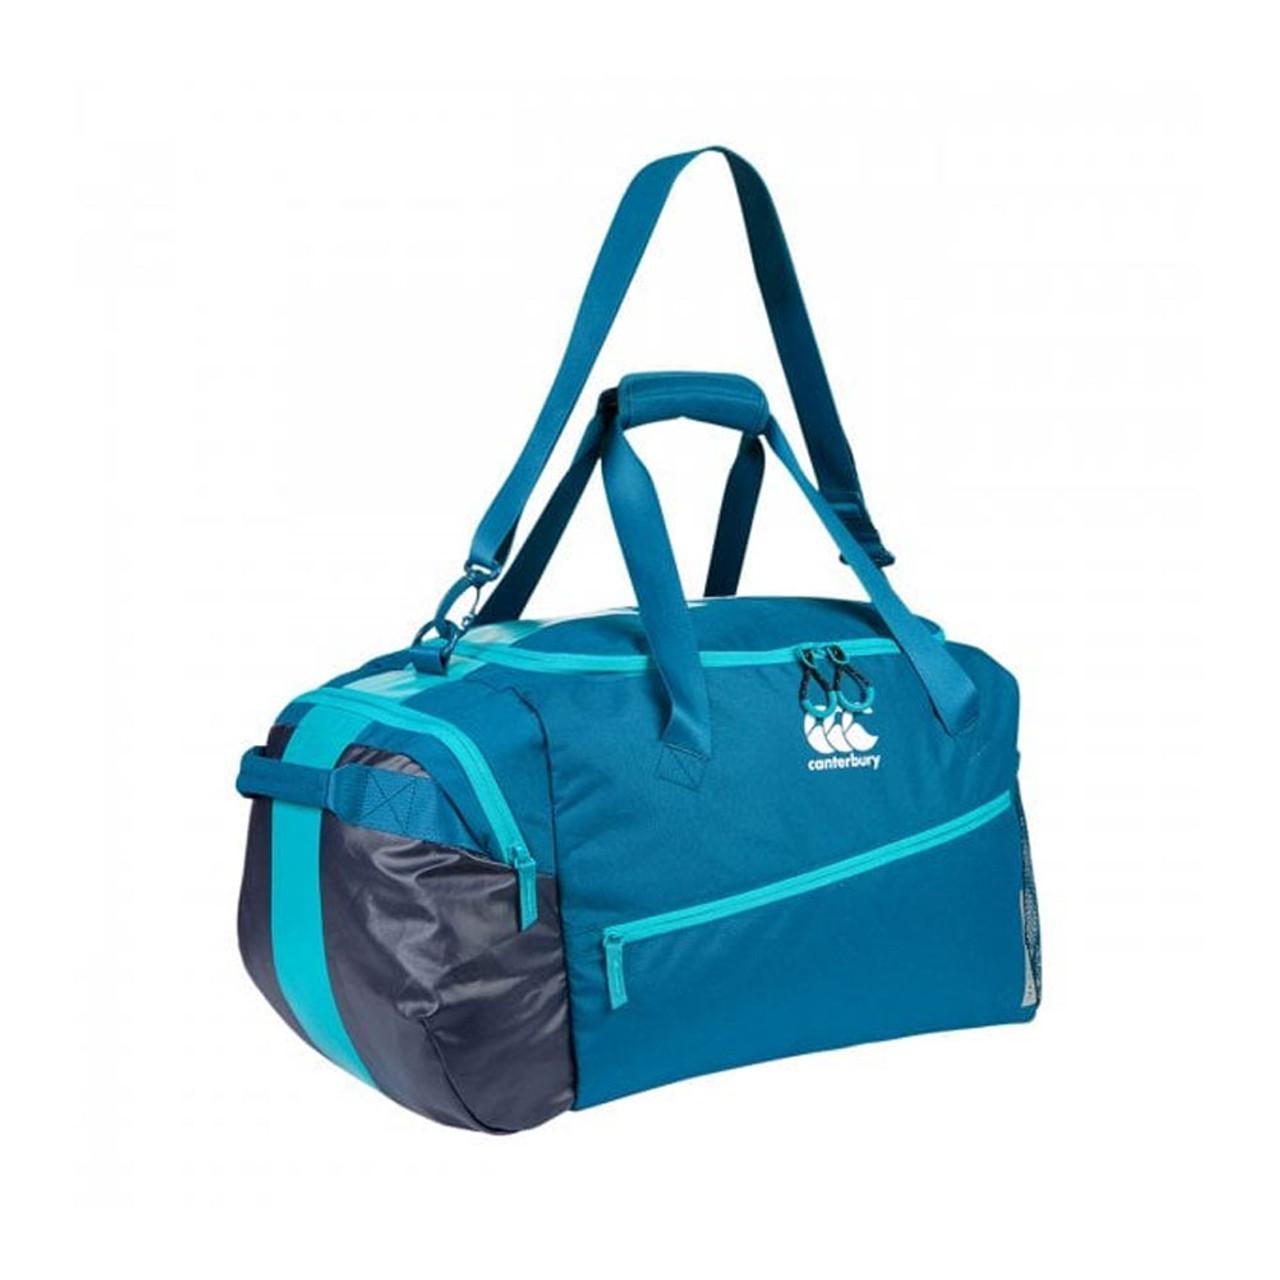 fb1698a5c8 CCC 2019 Ireland rugby Vaposhield Medium Sportsbag  moroccan blue